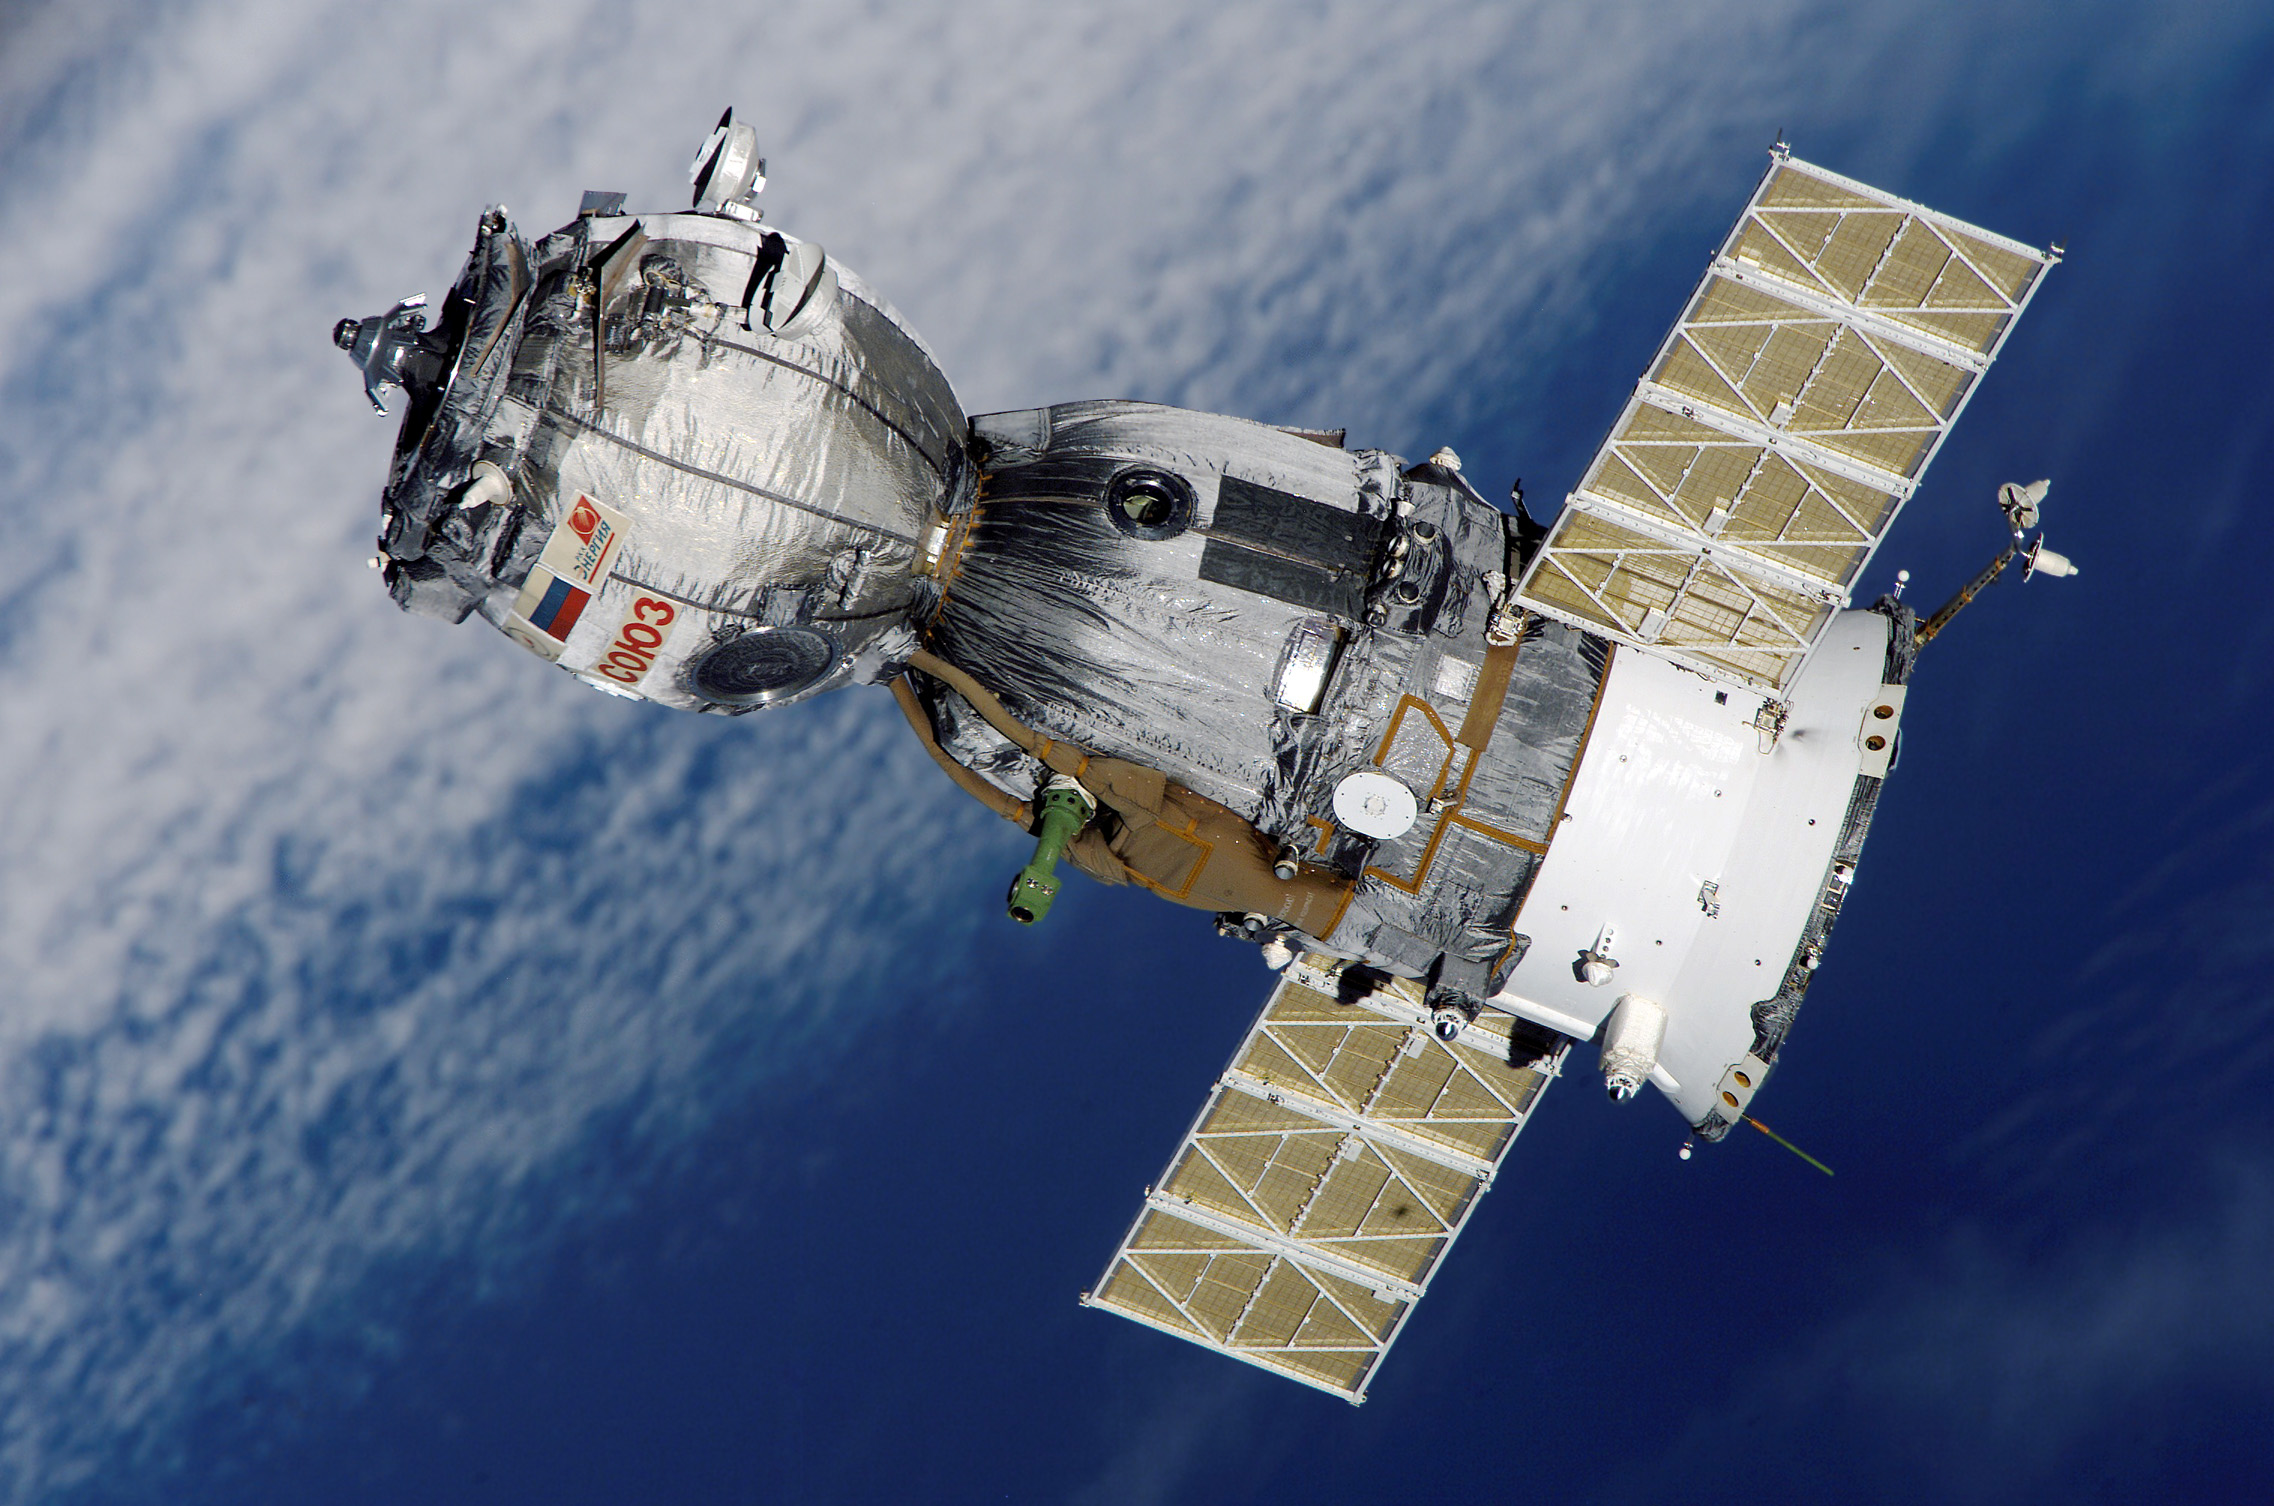 Space craft photo